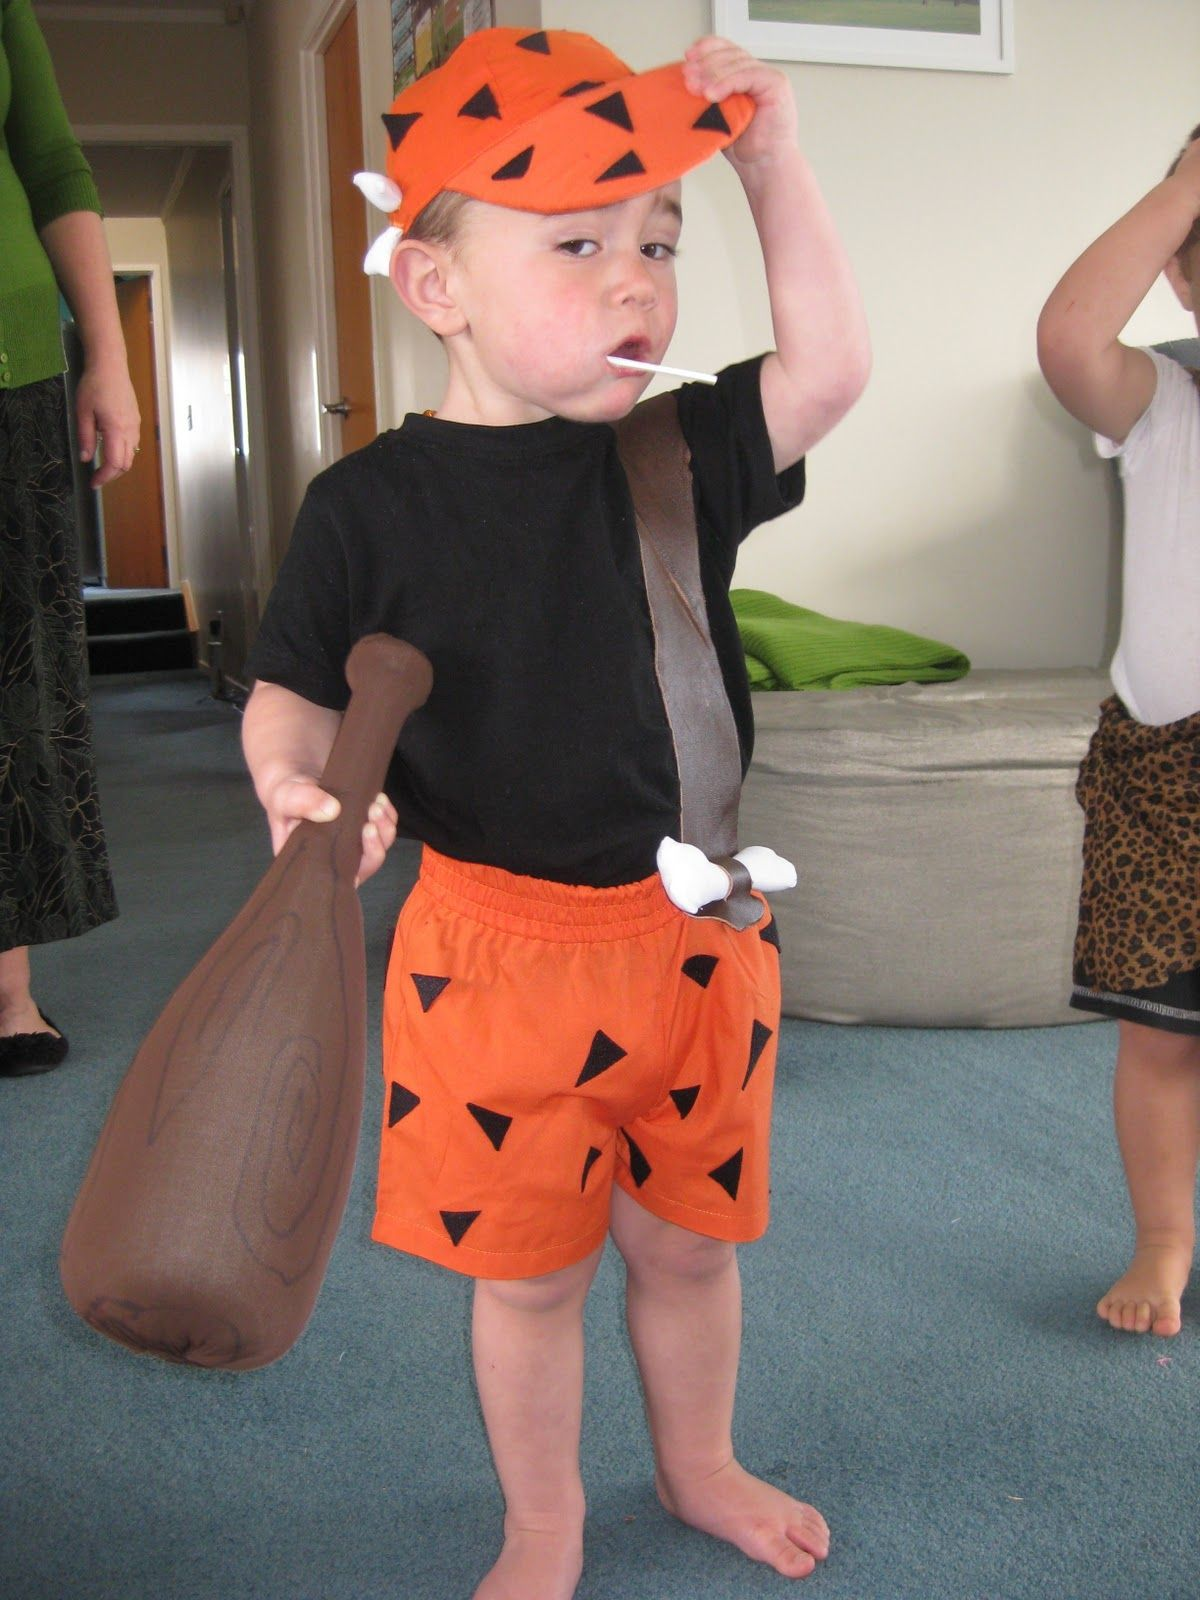 pebbles and bam bam costumes\ | Polkadotty Mum Pebbles u0026 Bam Bam Party Hard  sc 1 st  Pinterest & pebbles and bam bam costumes\ | Polkadotty Mum: Pebbles u0026 Bam Bam ...